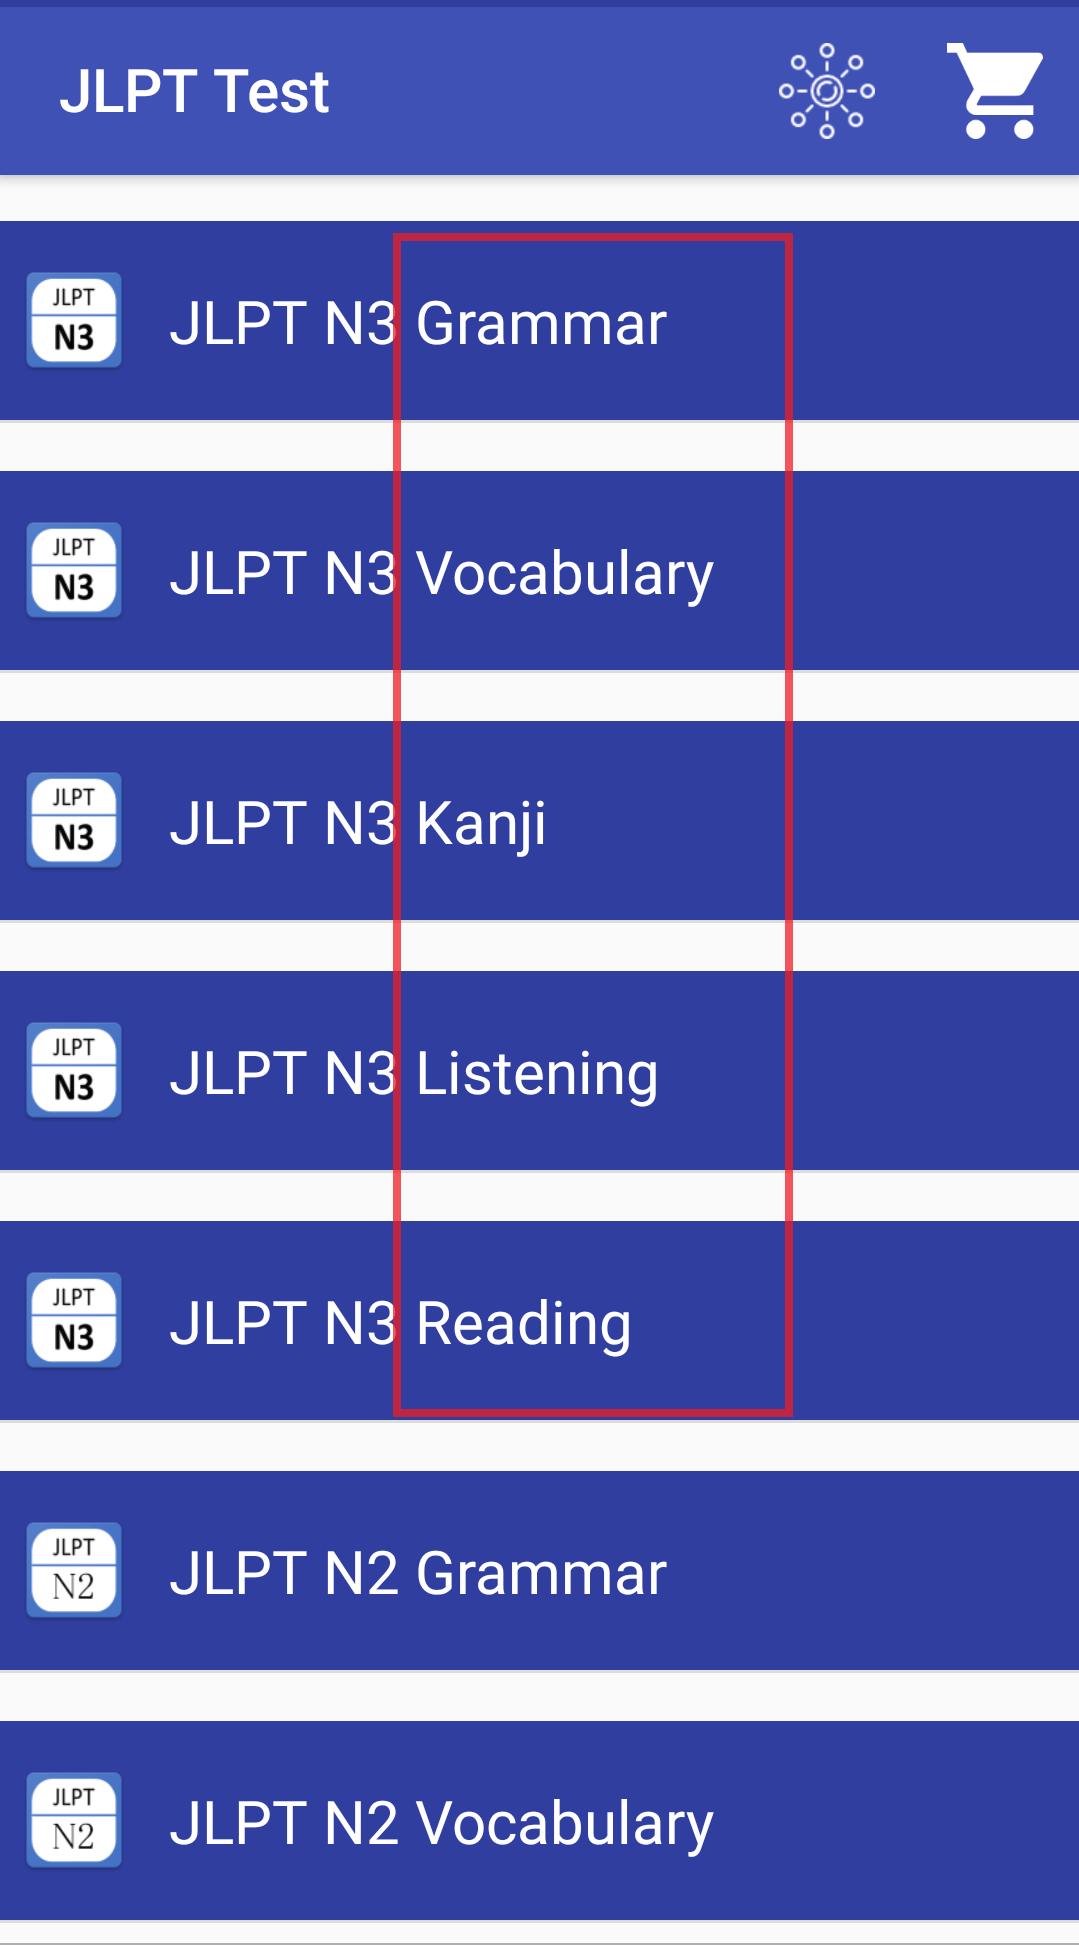 JLPT Test Categories